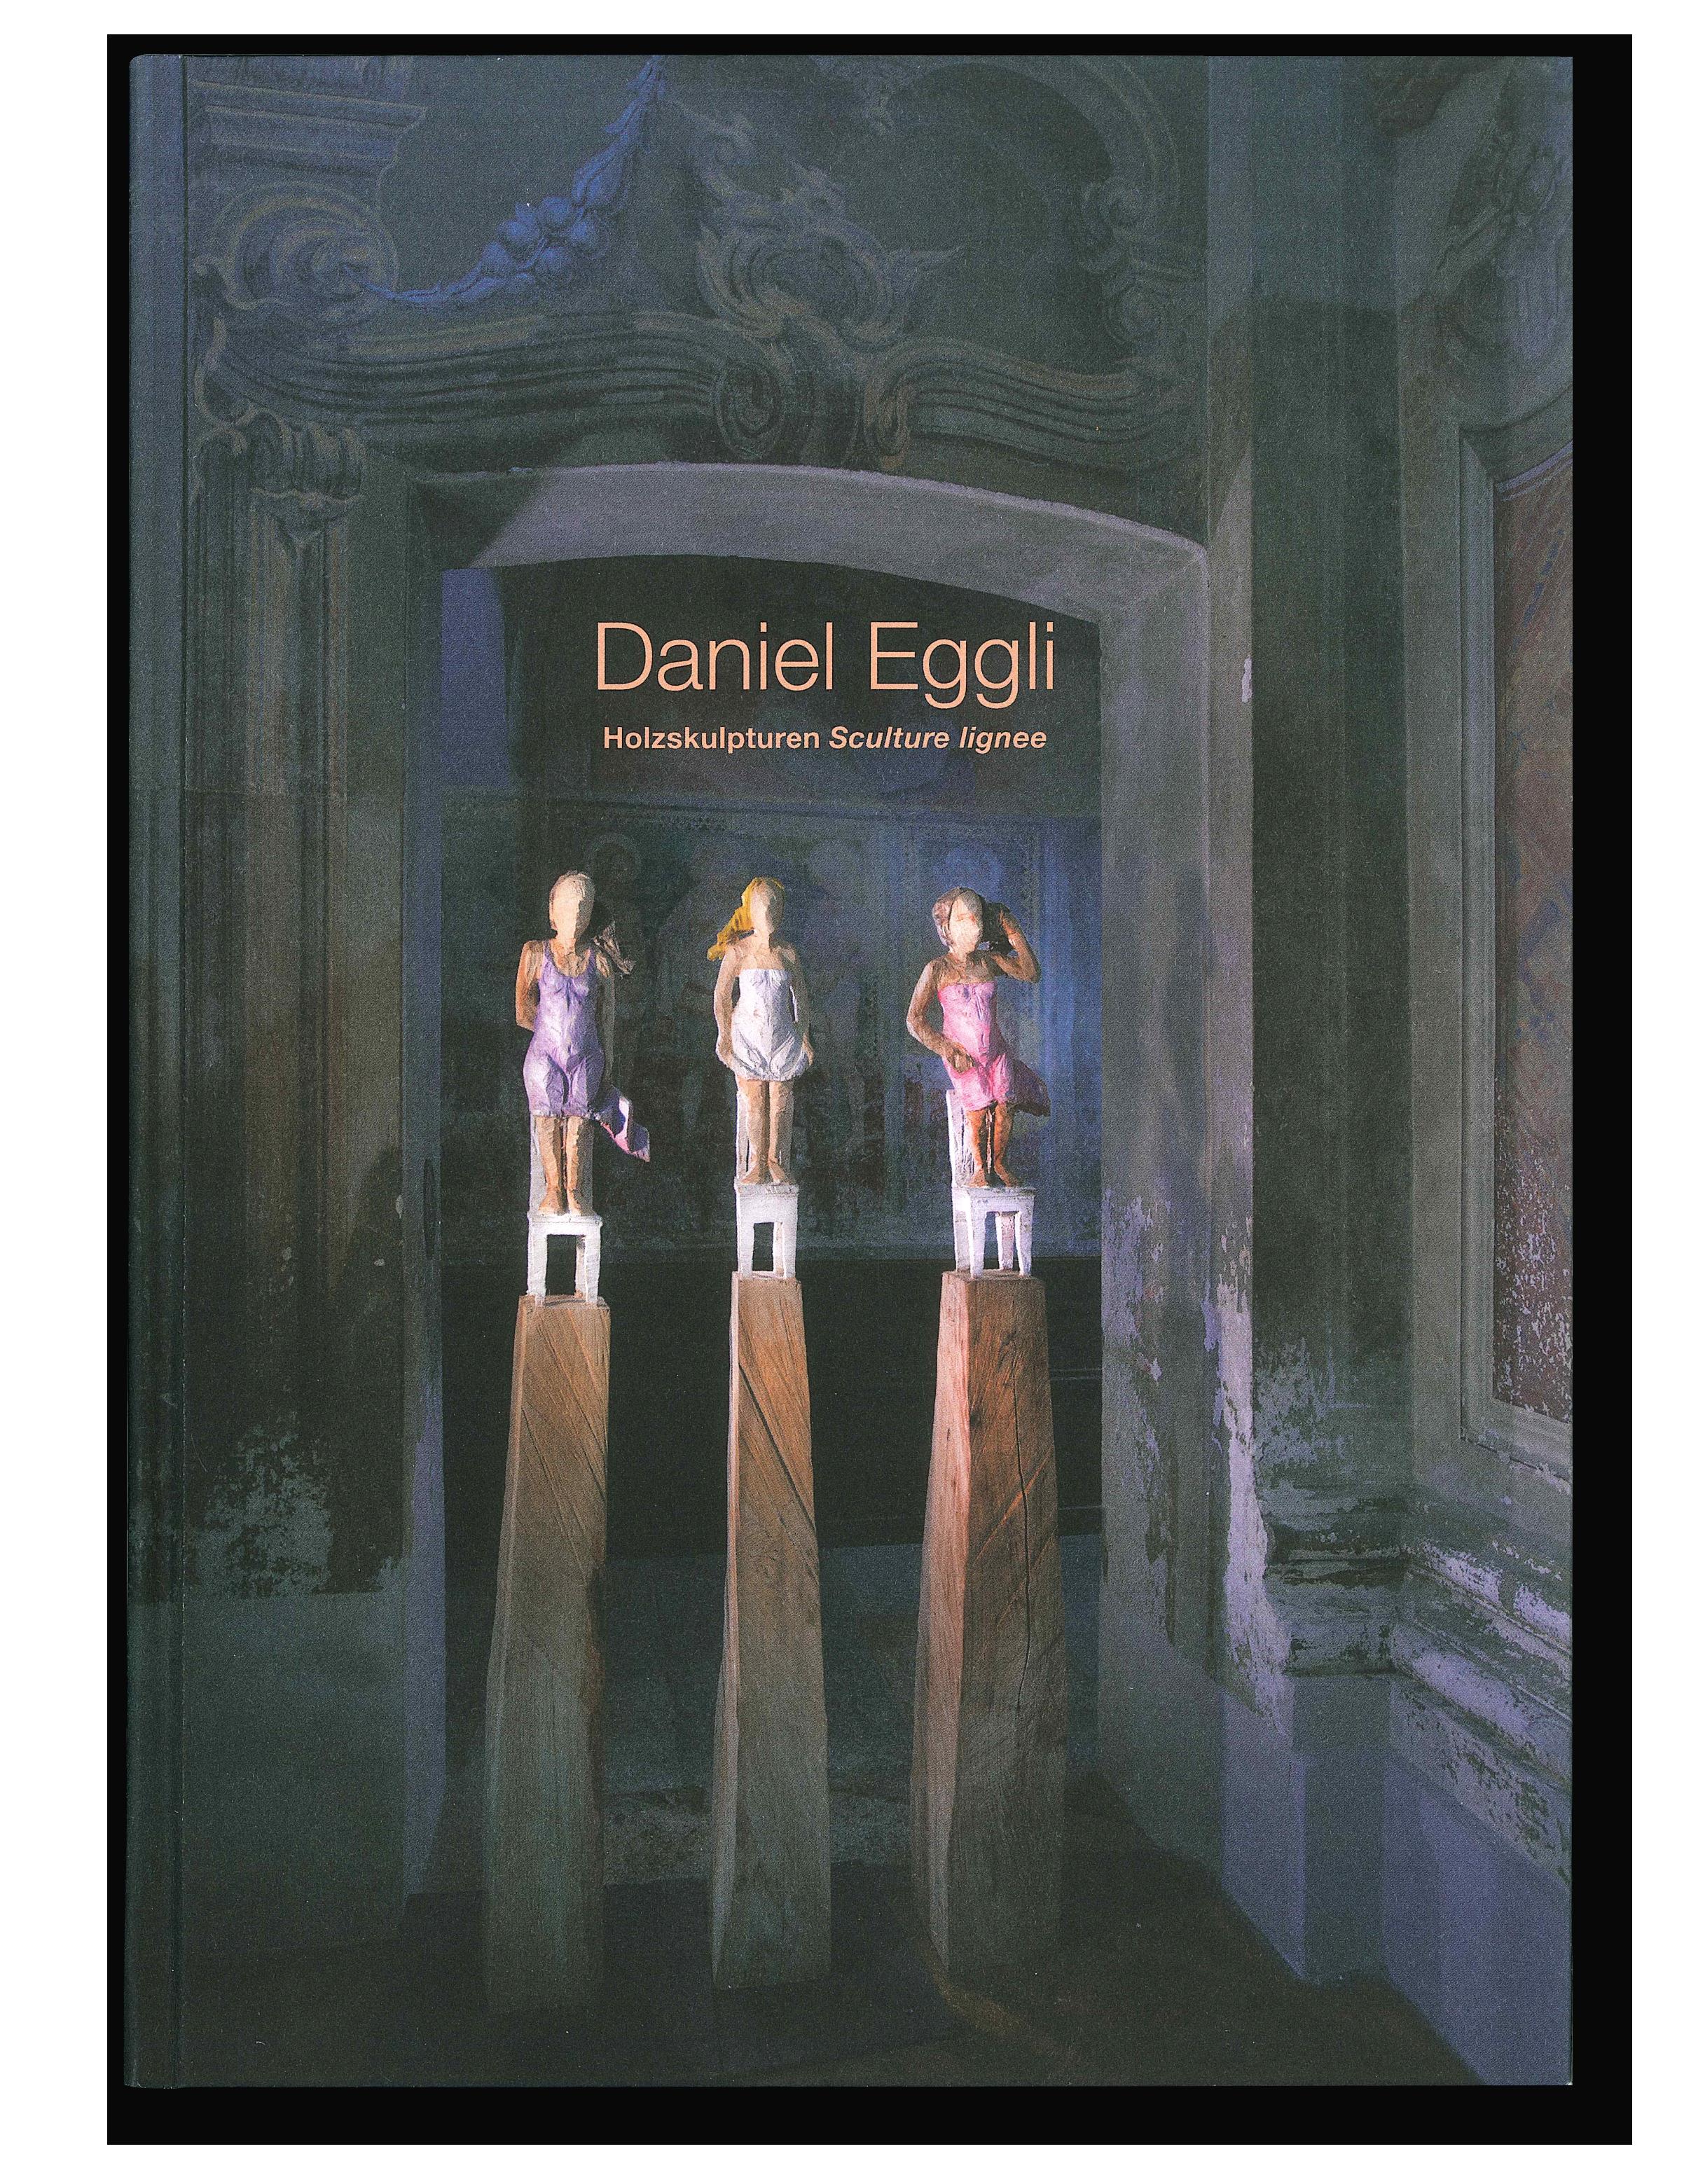 Daniel Eggli